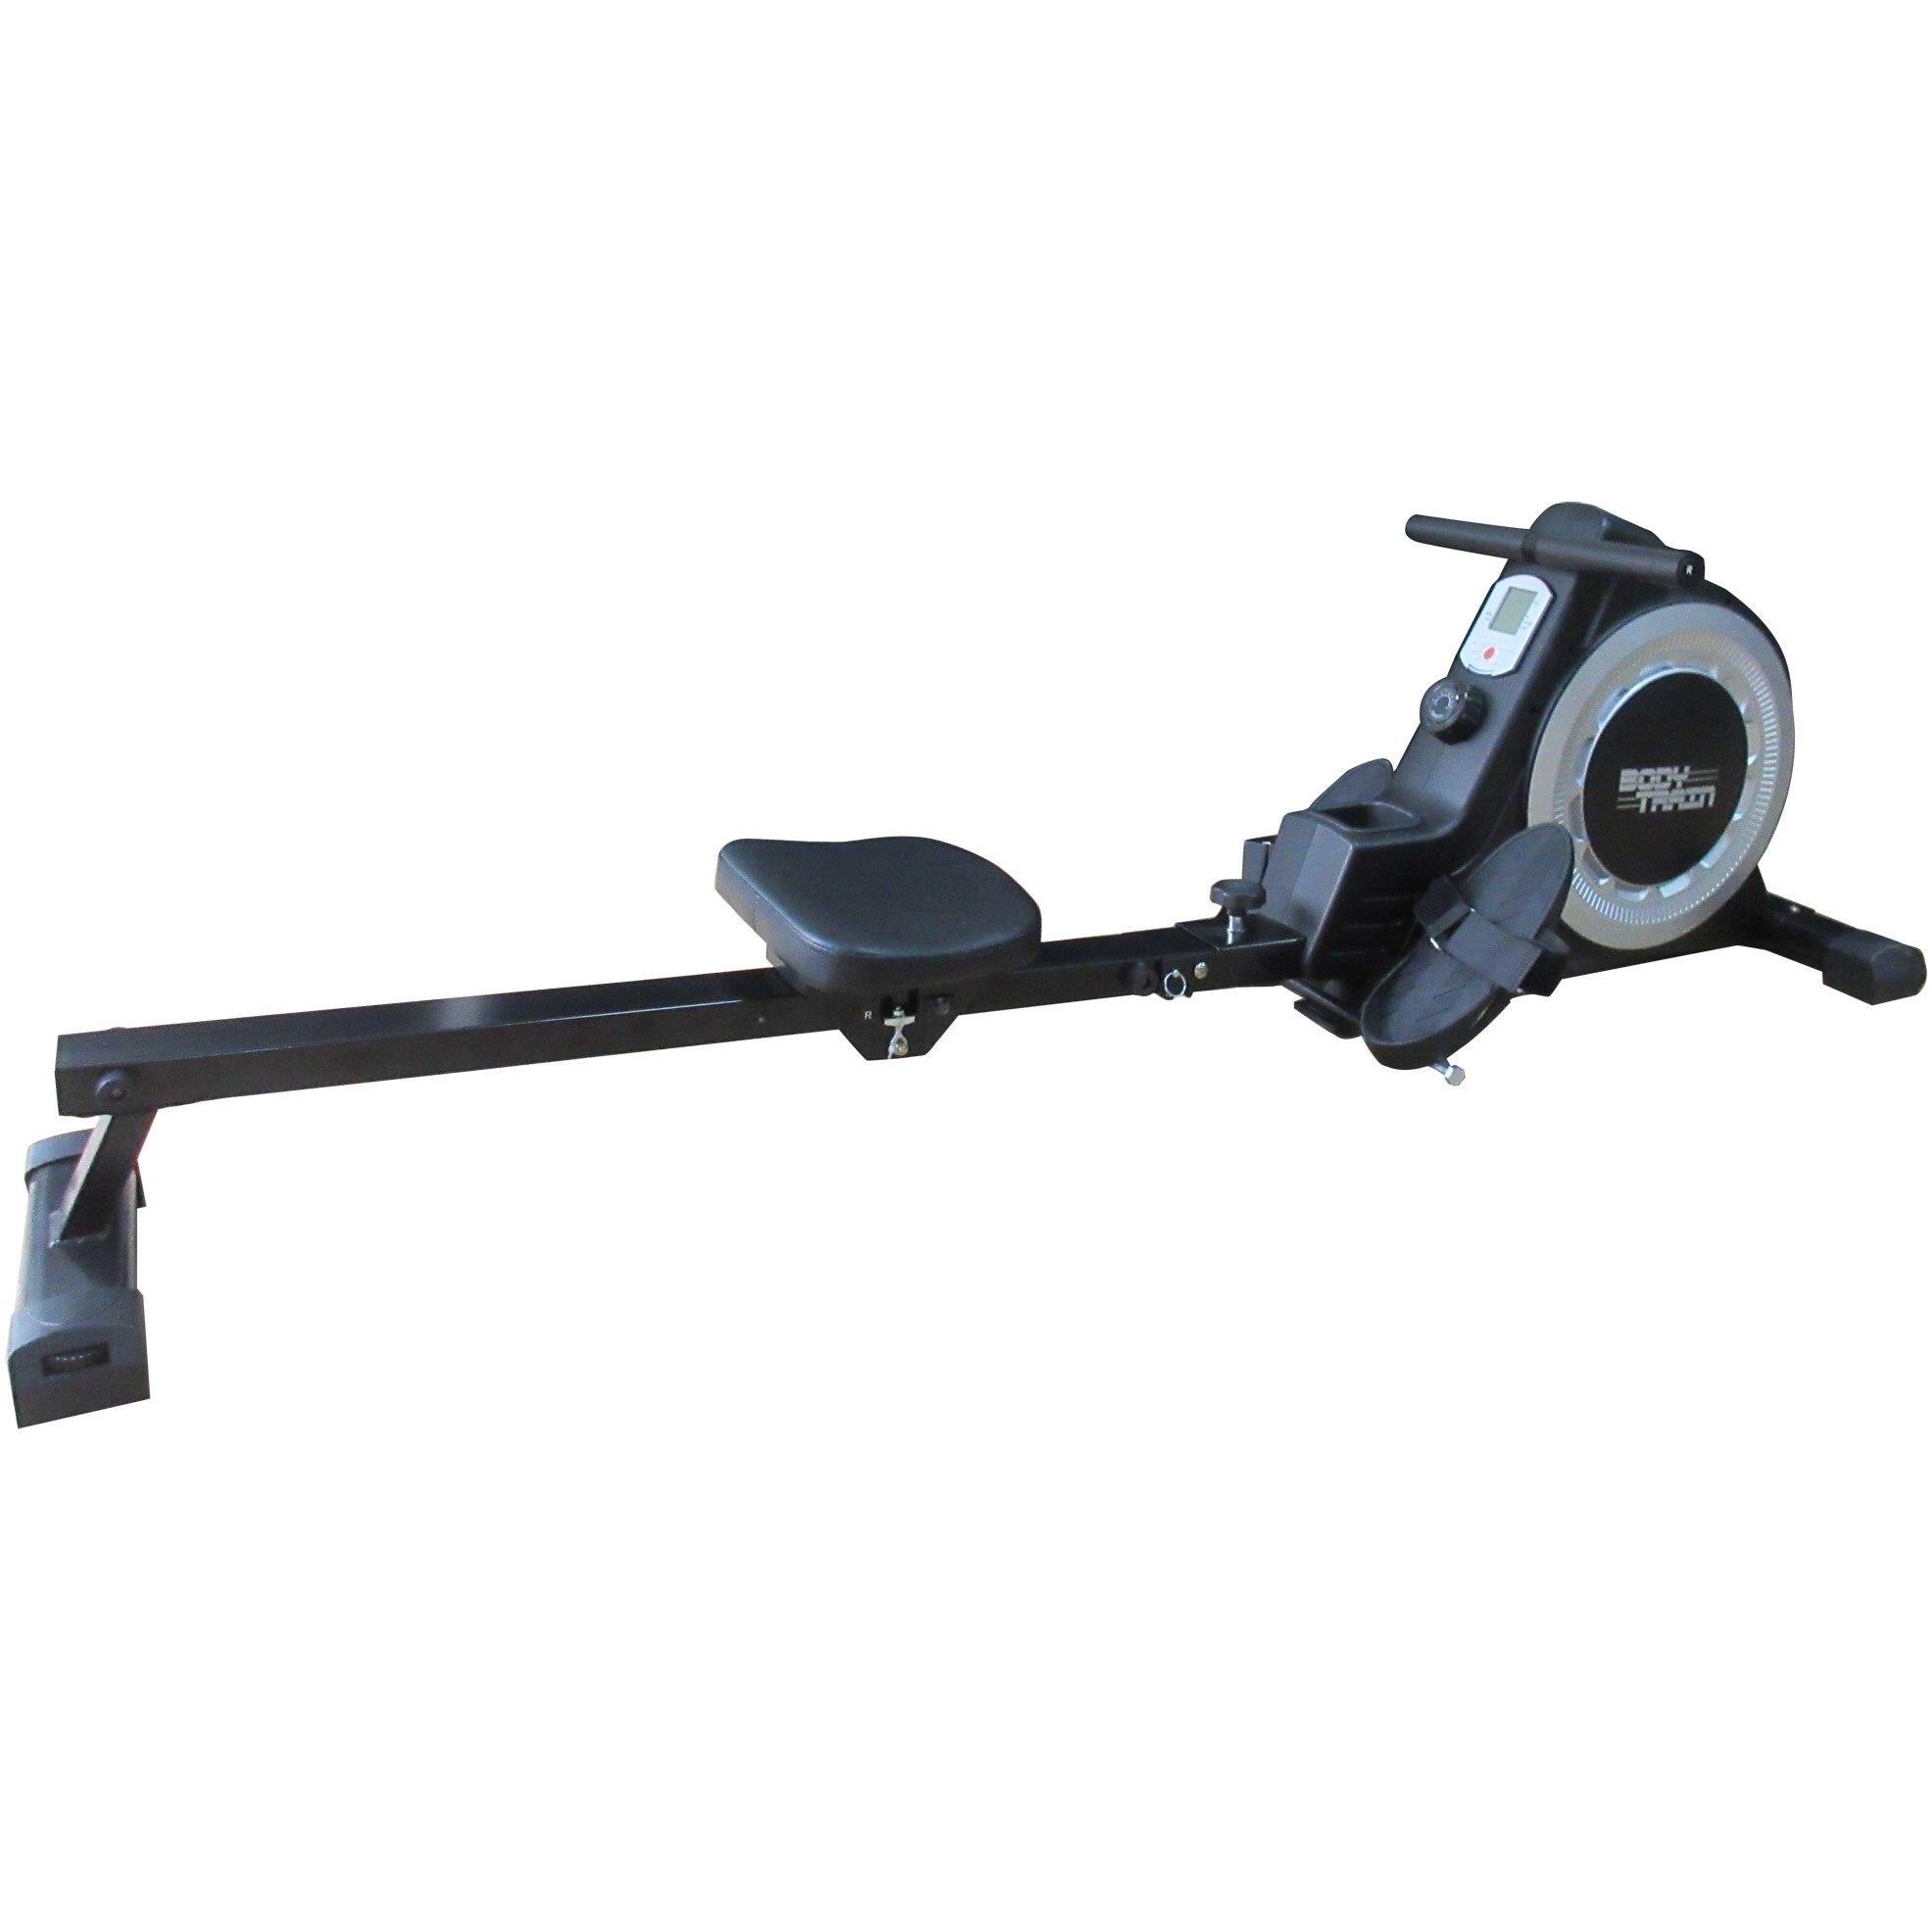 Fotografie Aparat de vaslit pentru fitness, magnetic, volanta 3 kg, greutate maxima utilizator: 100 kg